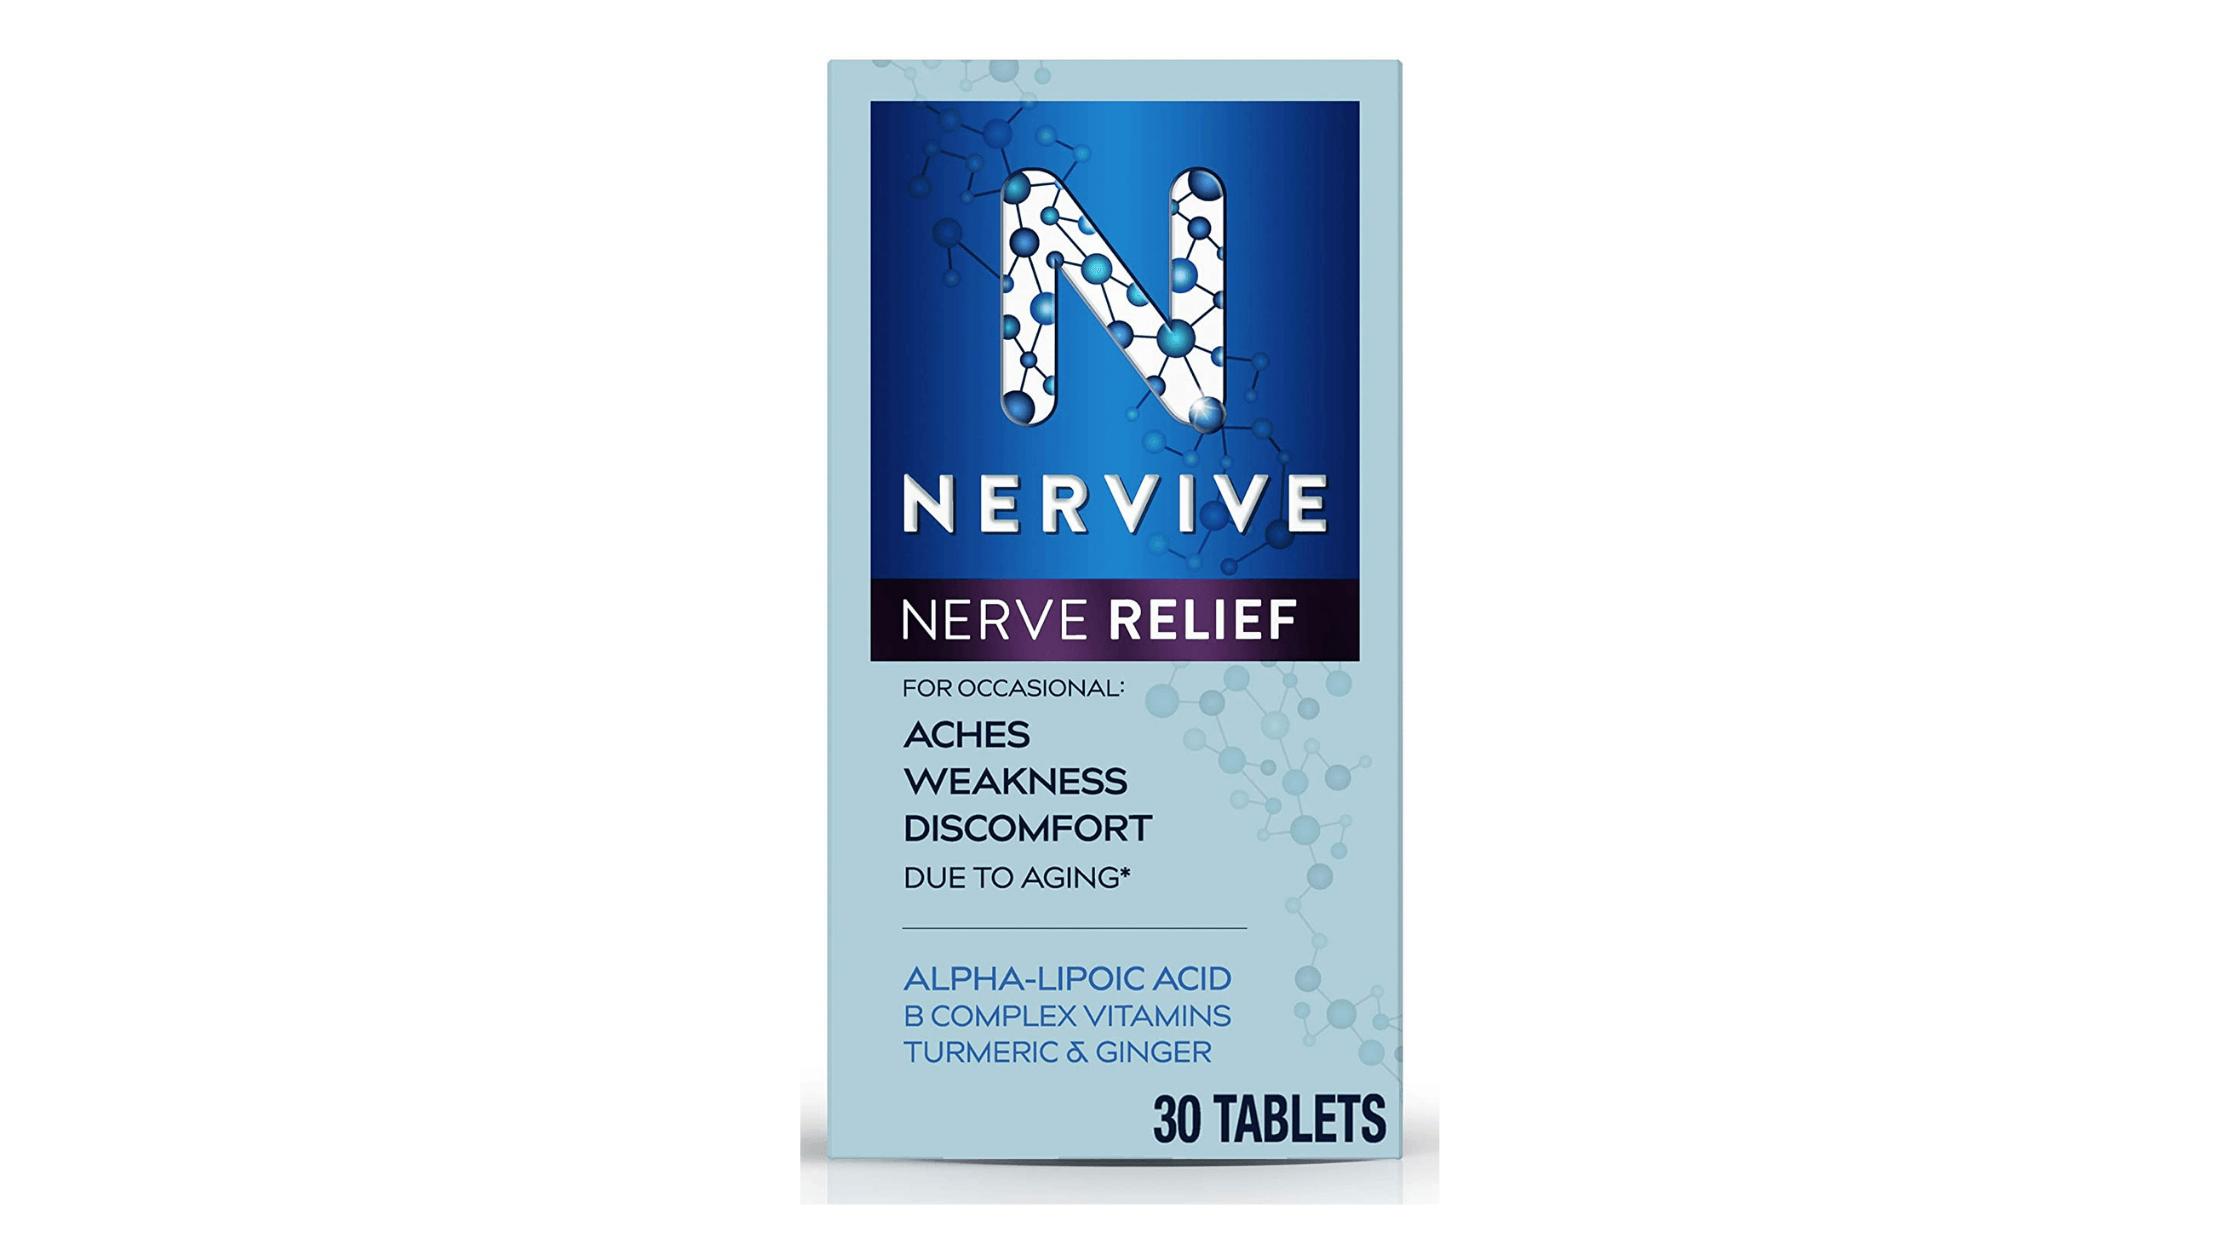 Nervive Nerve Relief Reviews